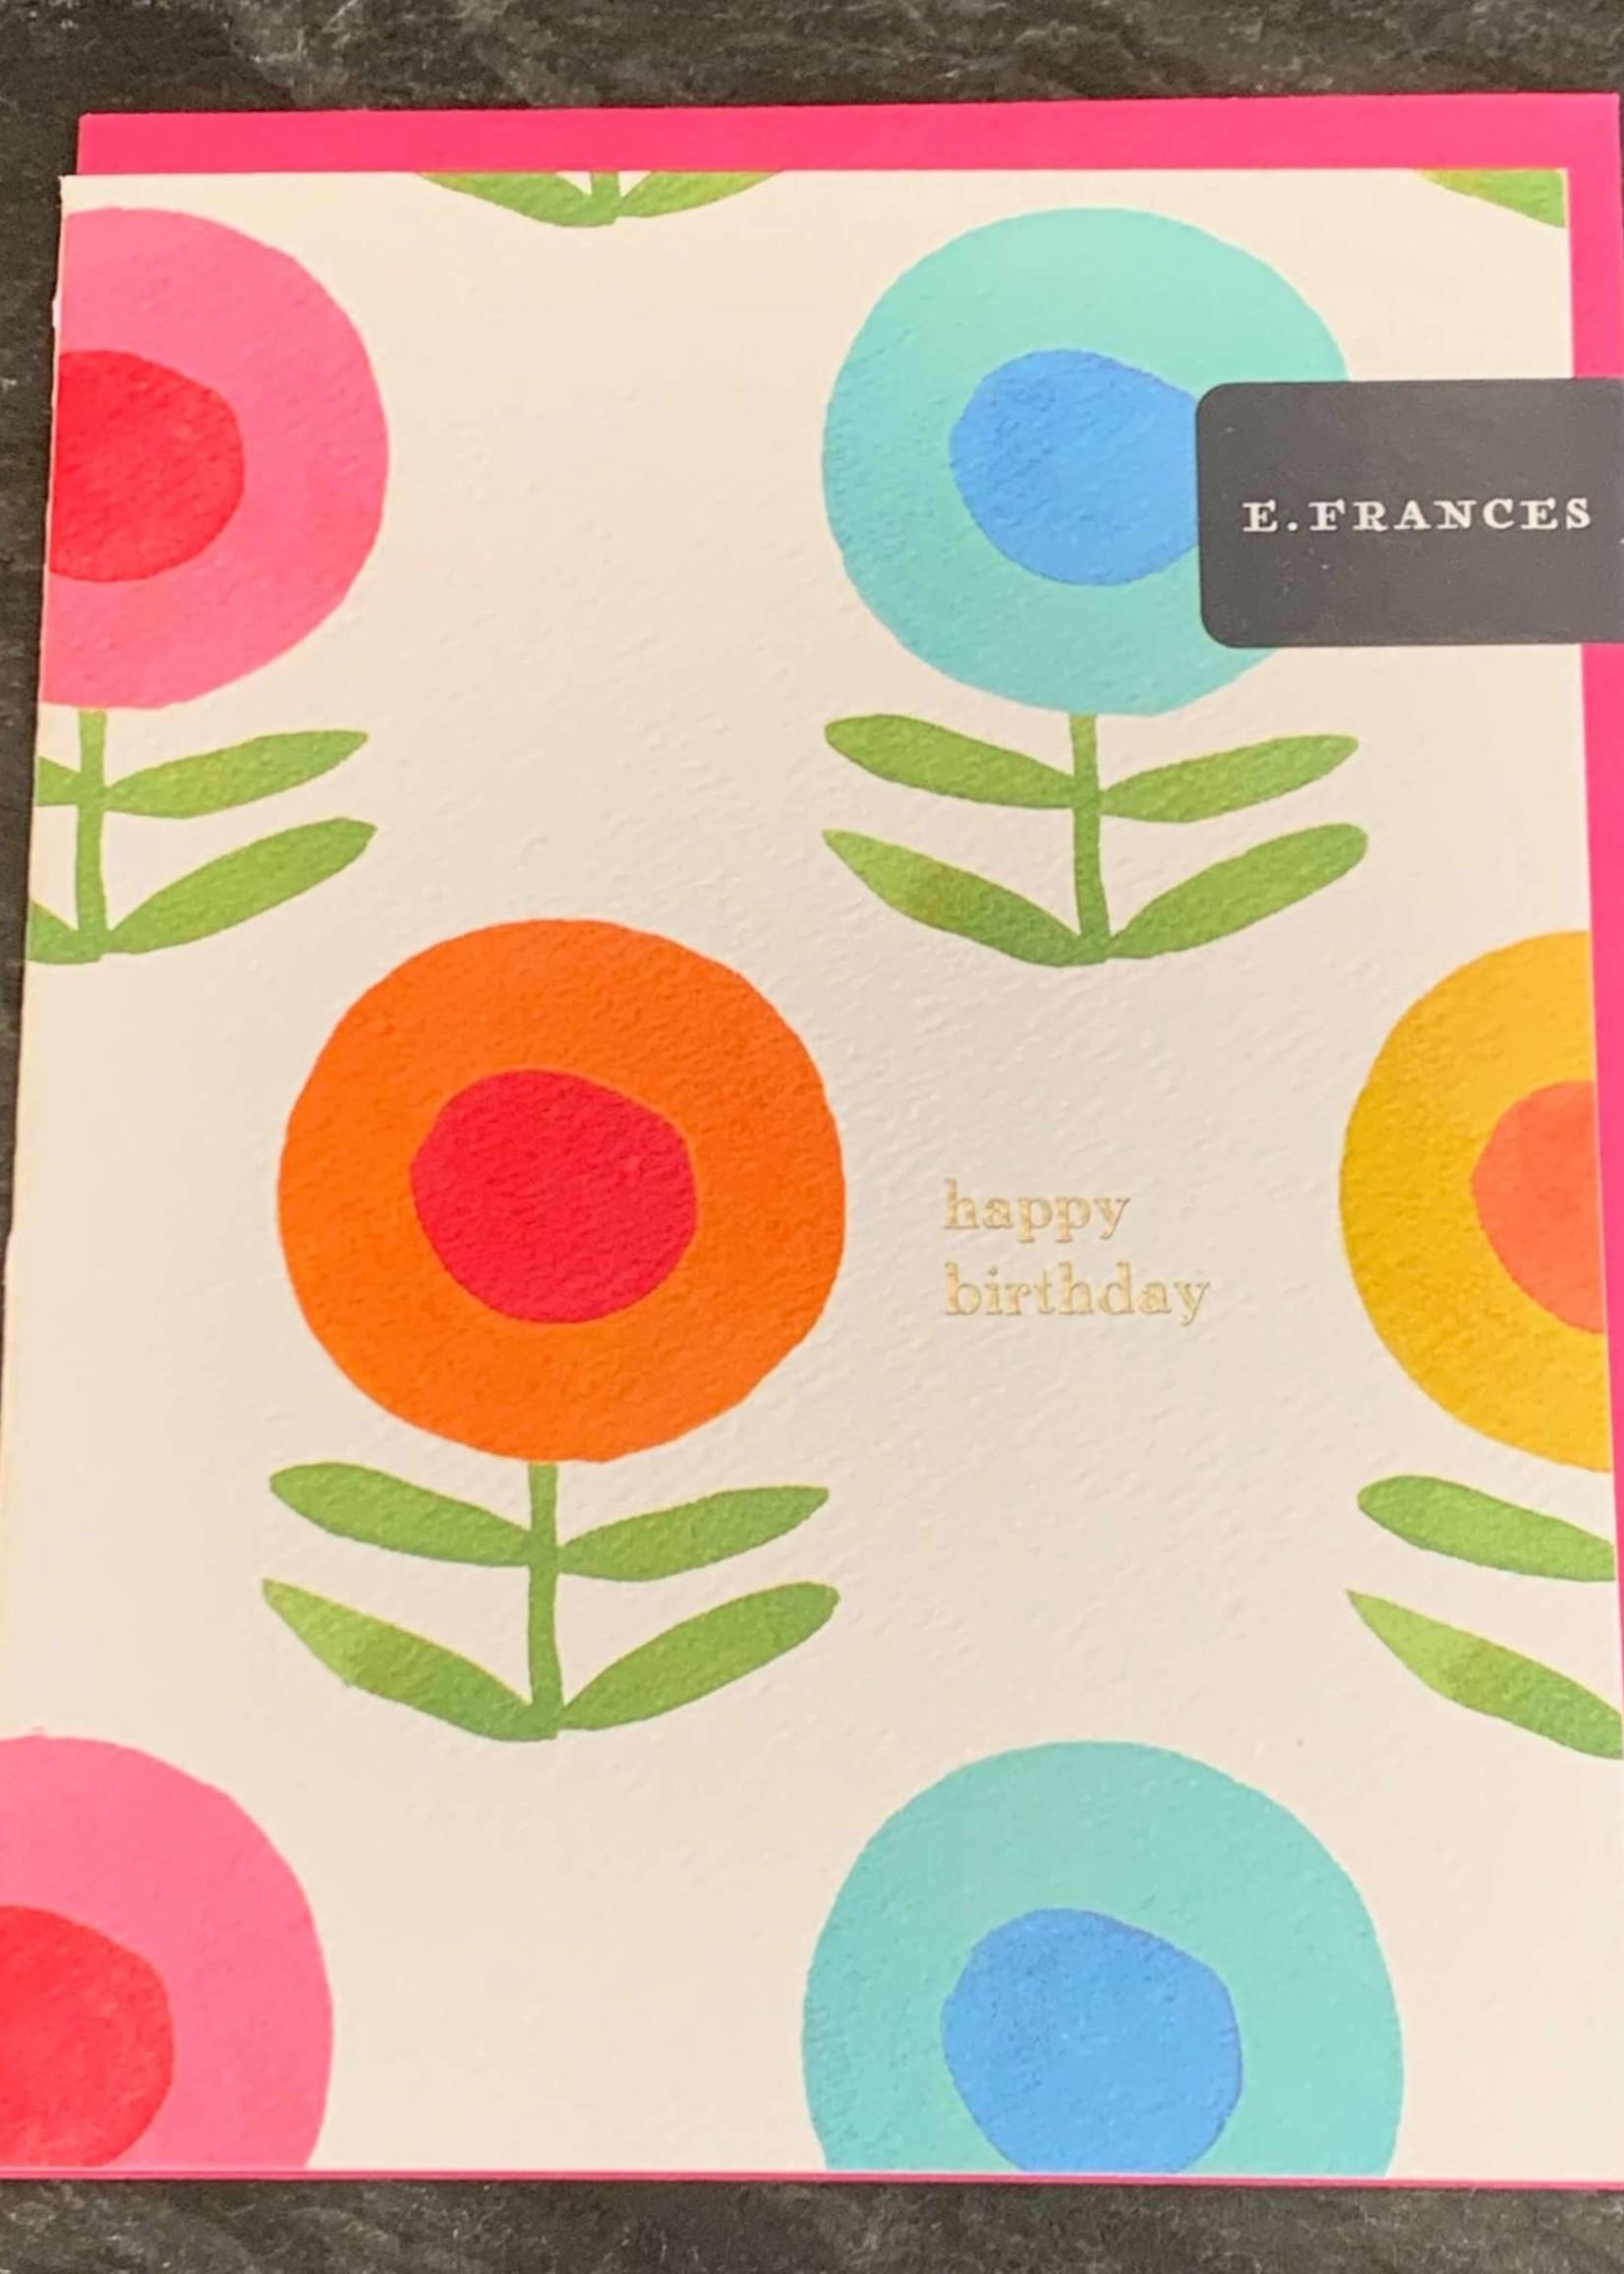 E. Frances Paper E. Frances Happy Flowers Birthday